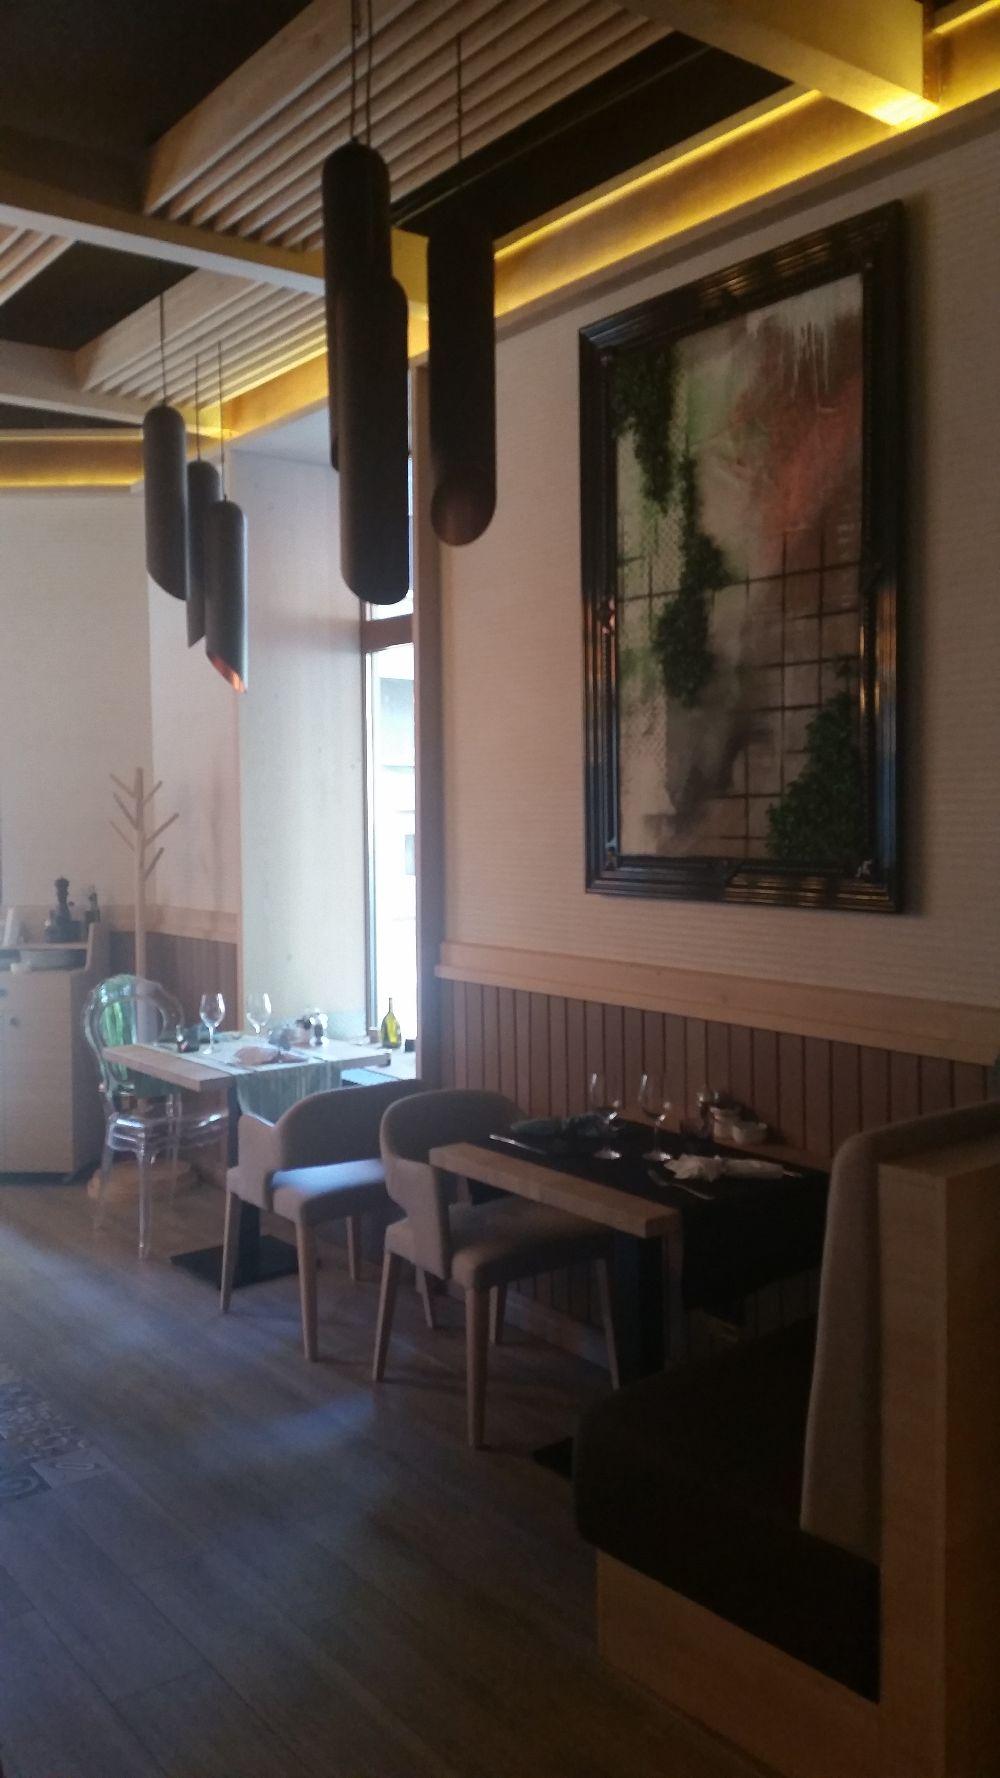 adelaparvu.com despre amenajare restaurant Naan, Bucuresti, design interior Delta Studio, Victor Grosu, Mihai Constantin, Iuliana Dinca (5)